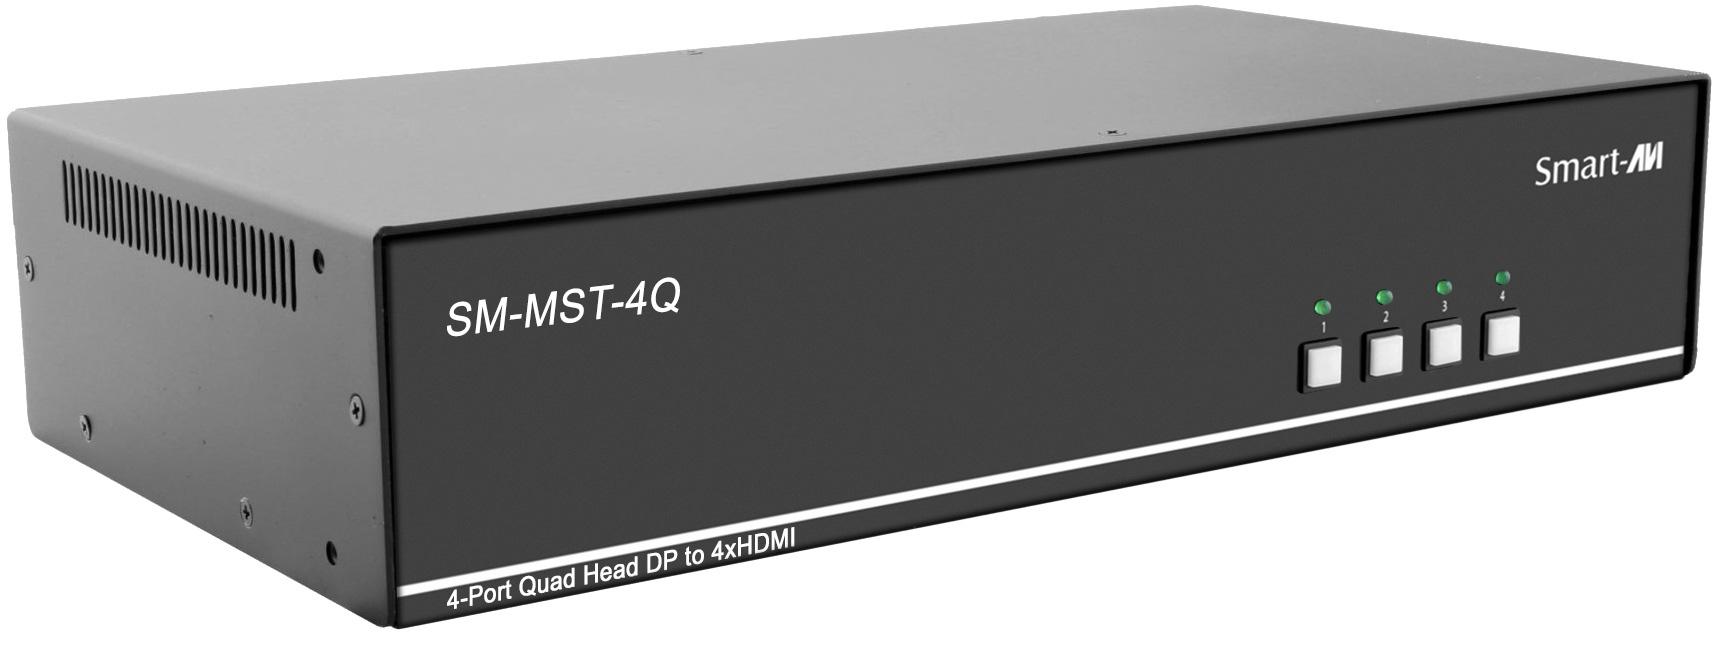 Smart AVI SM-MST-4Q MultiStream Transport Technology KVM Switch with Quad 4K HDMI Out - 4 Port SAVI-SM-MST-4Q